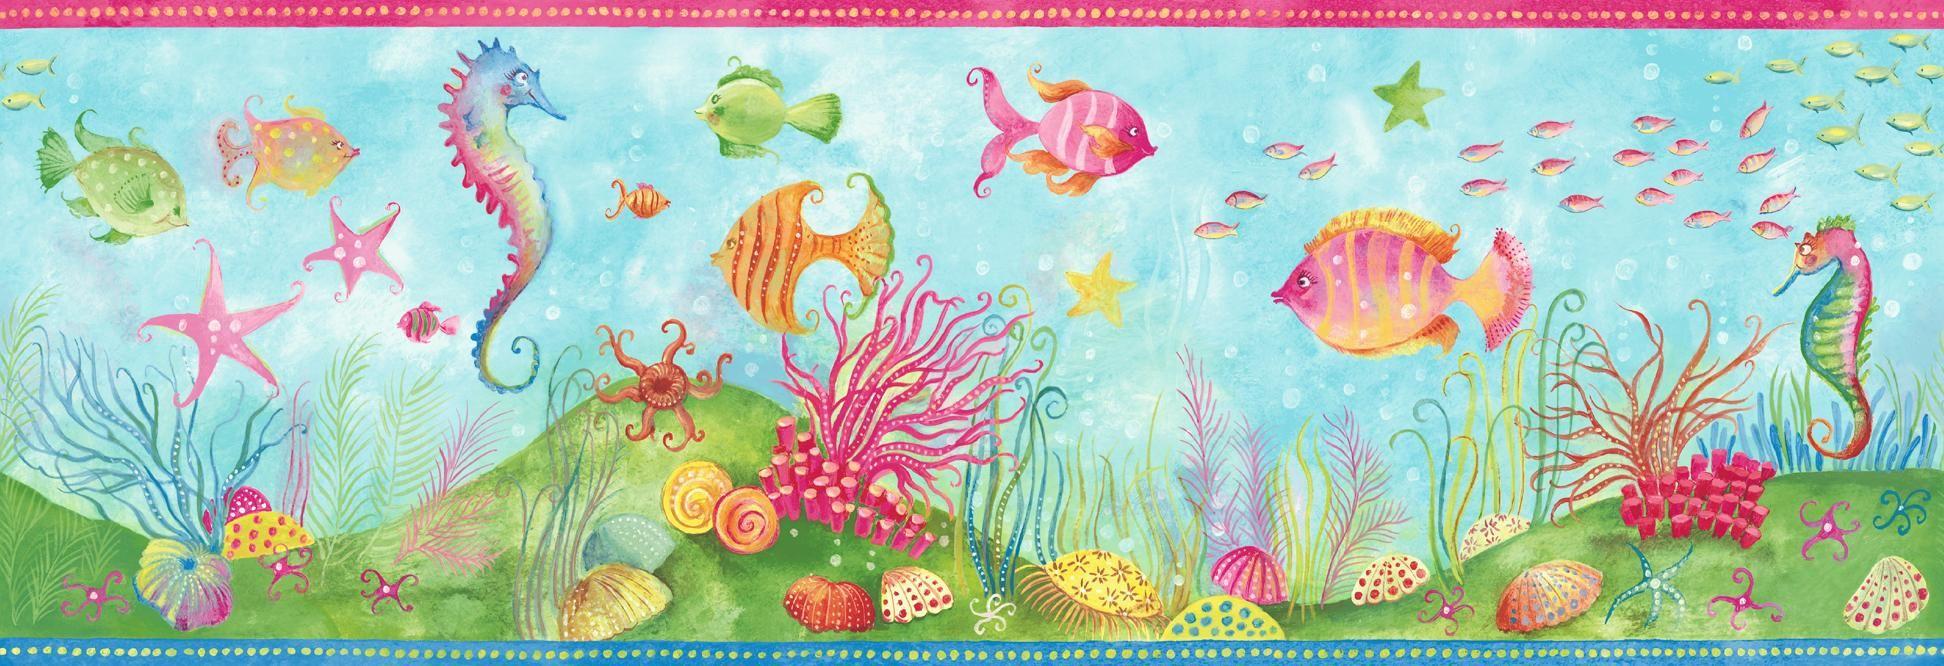 Blue Mountain Wallcovering Fun N Flirty Fish Border Wallpaper Wallpaper Border Kids Fishing Bathroom Decor Wallpaper Border